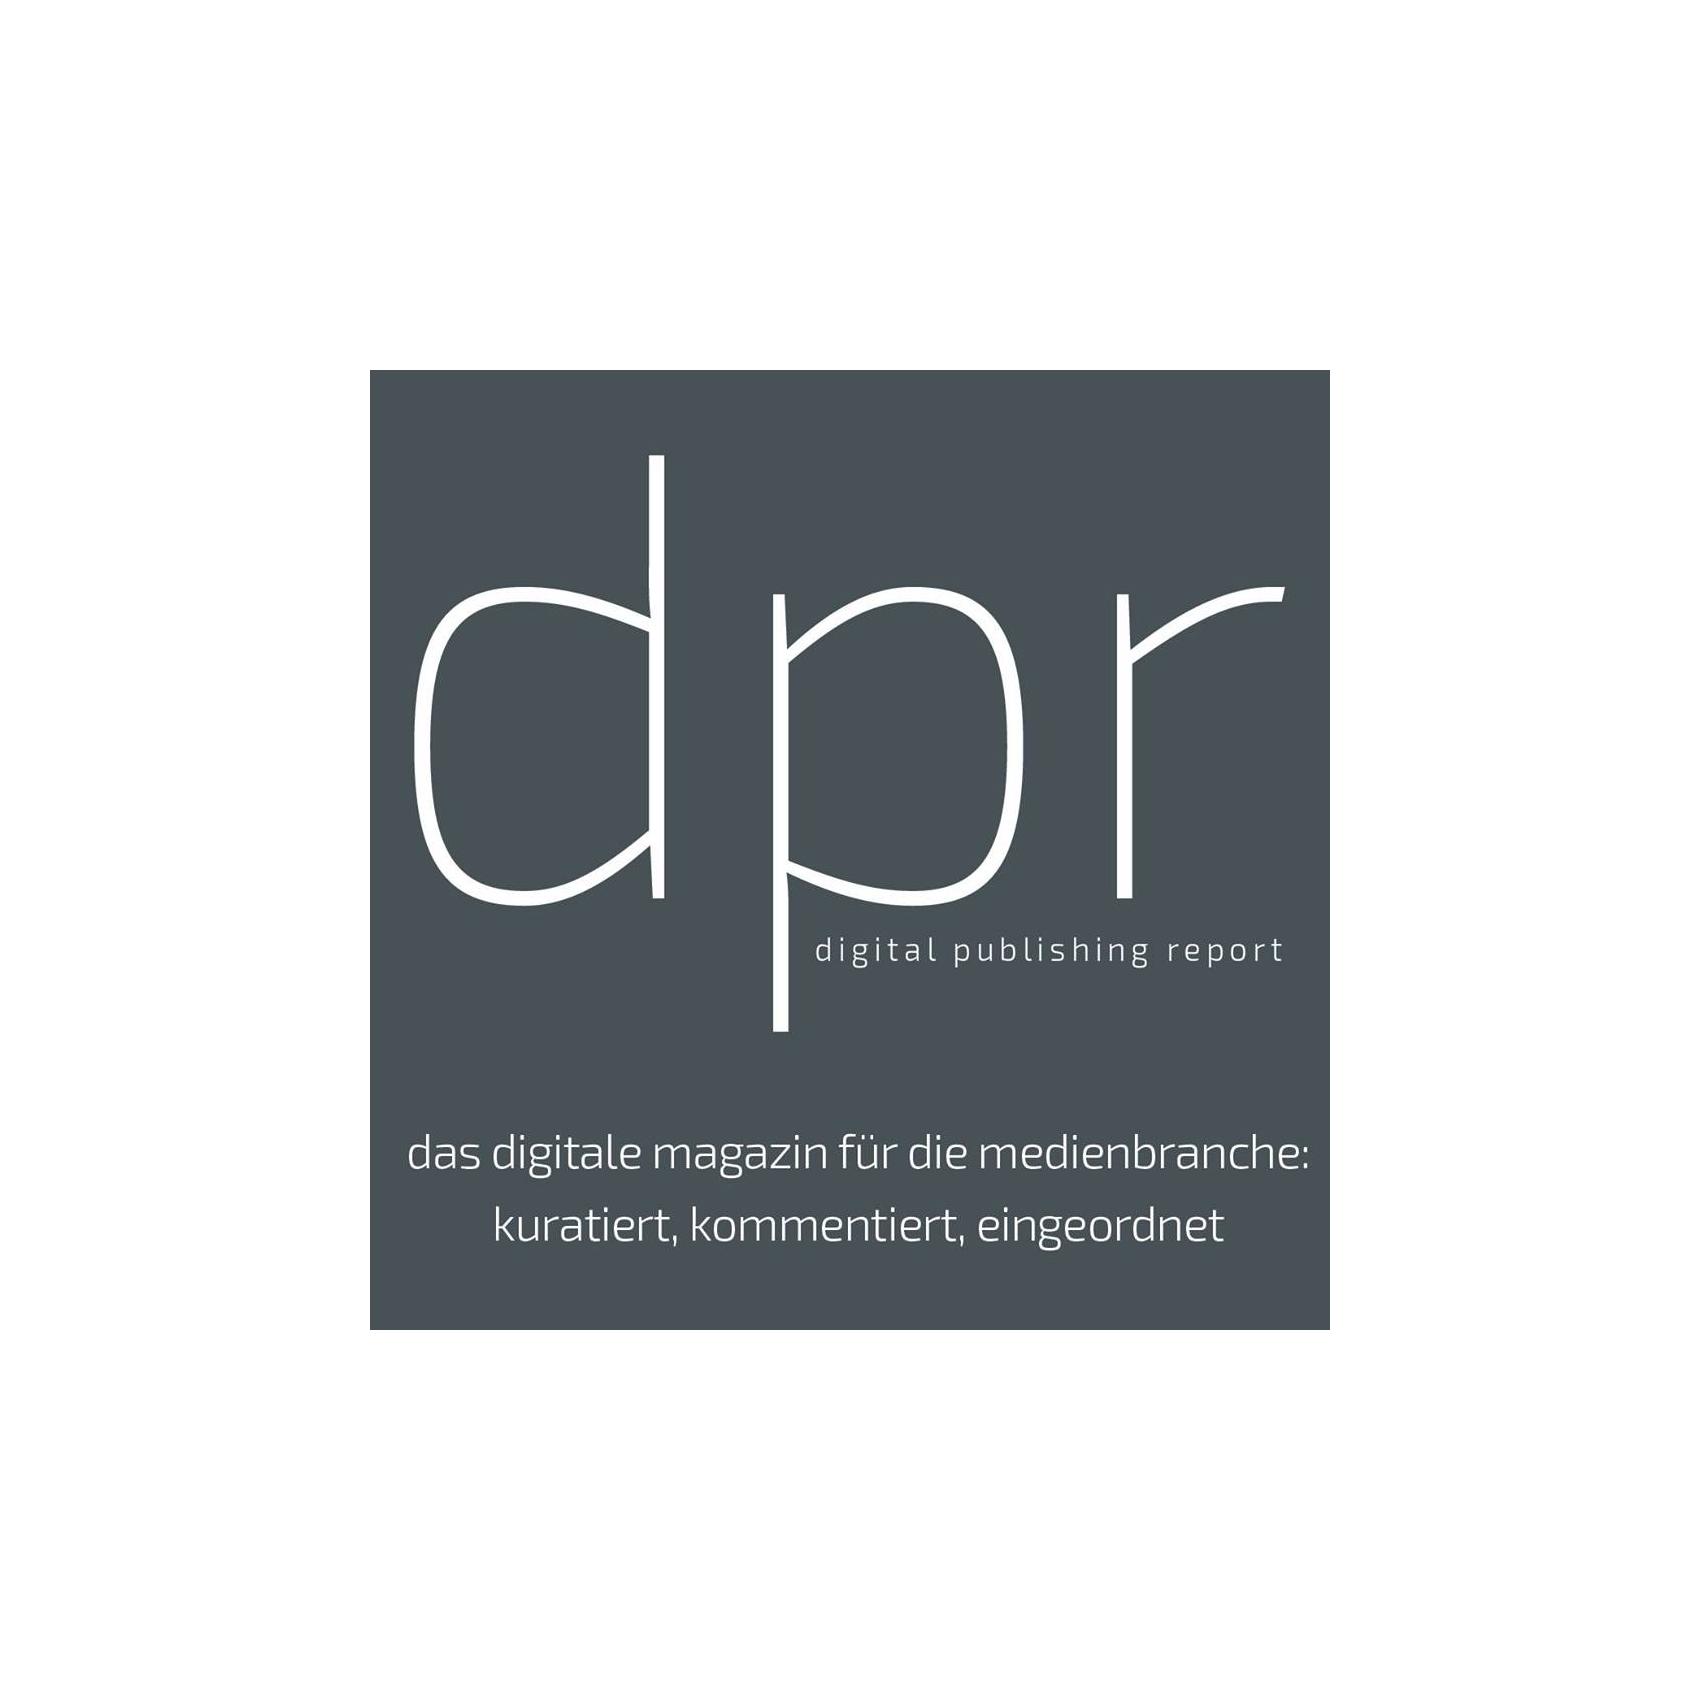 digital publishing report